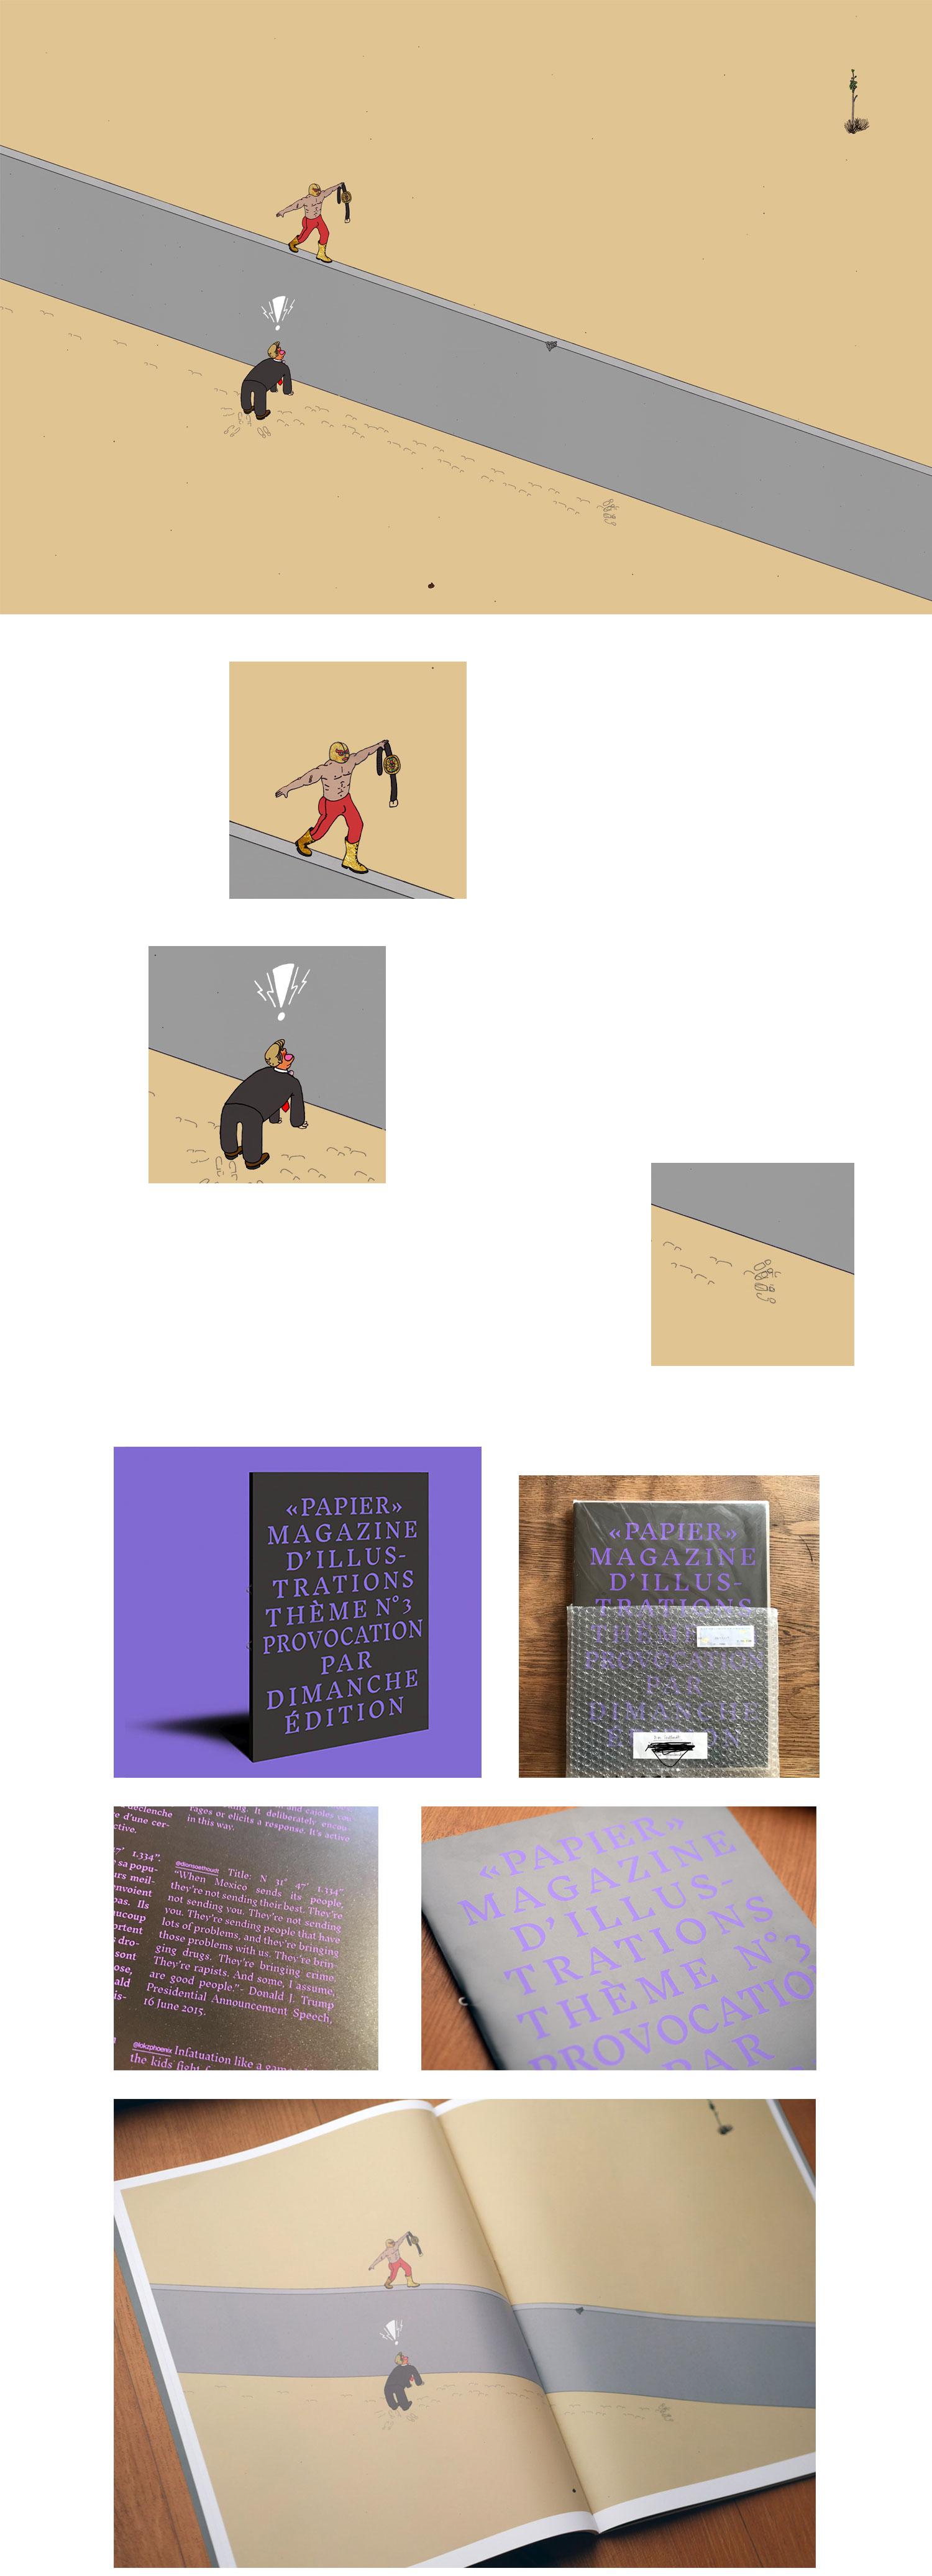 Studio Soethoudt | Illustrations